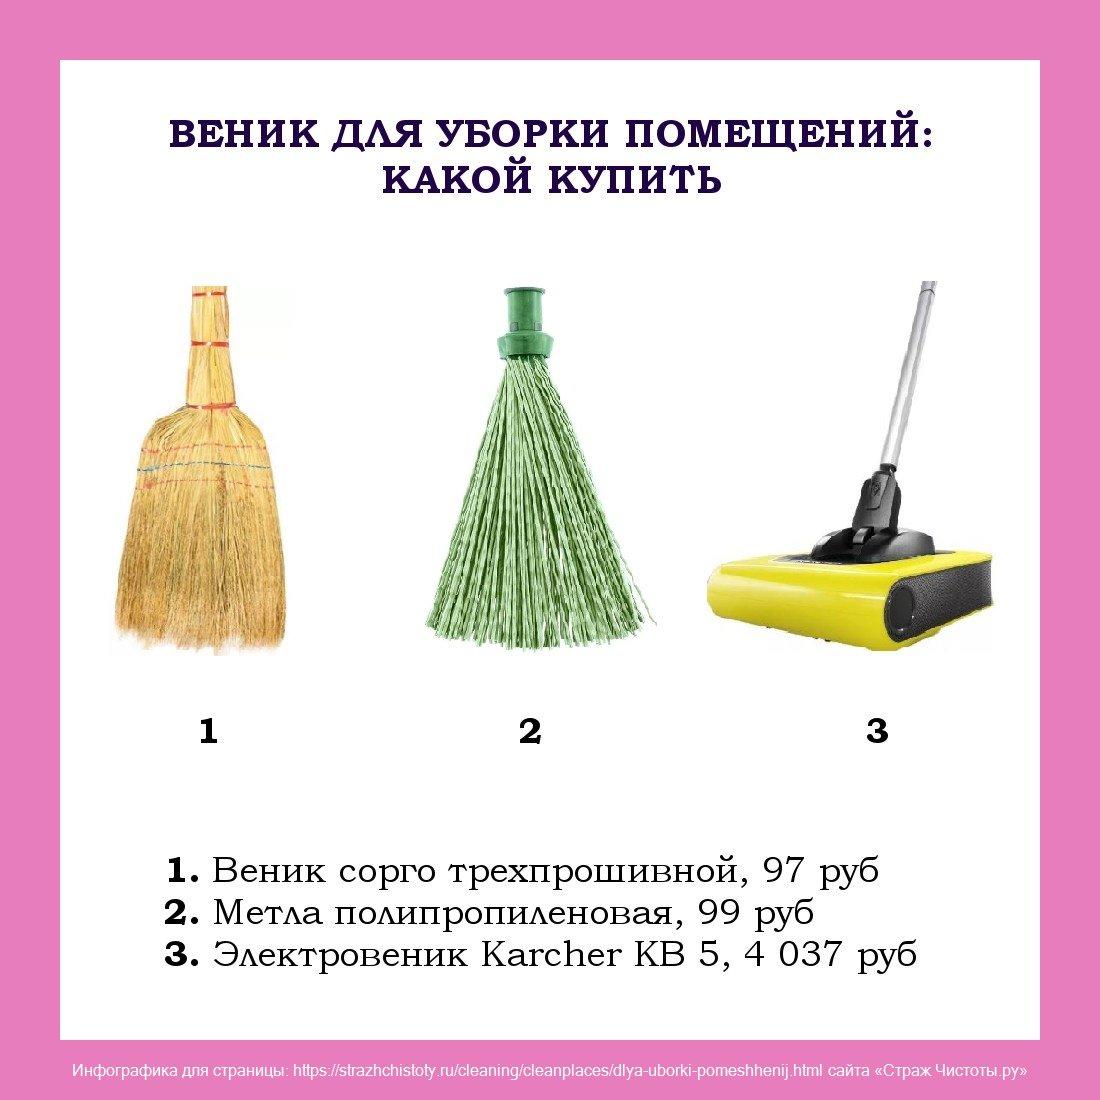 веник для уборки помещений